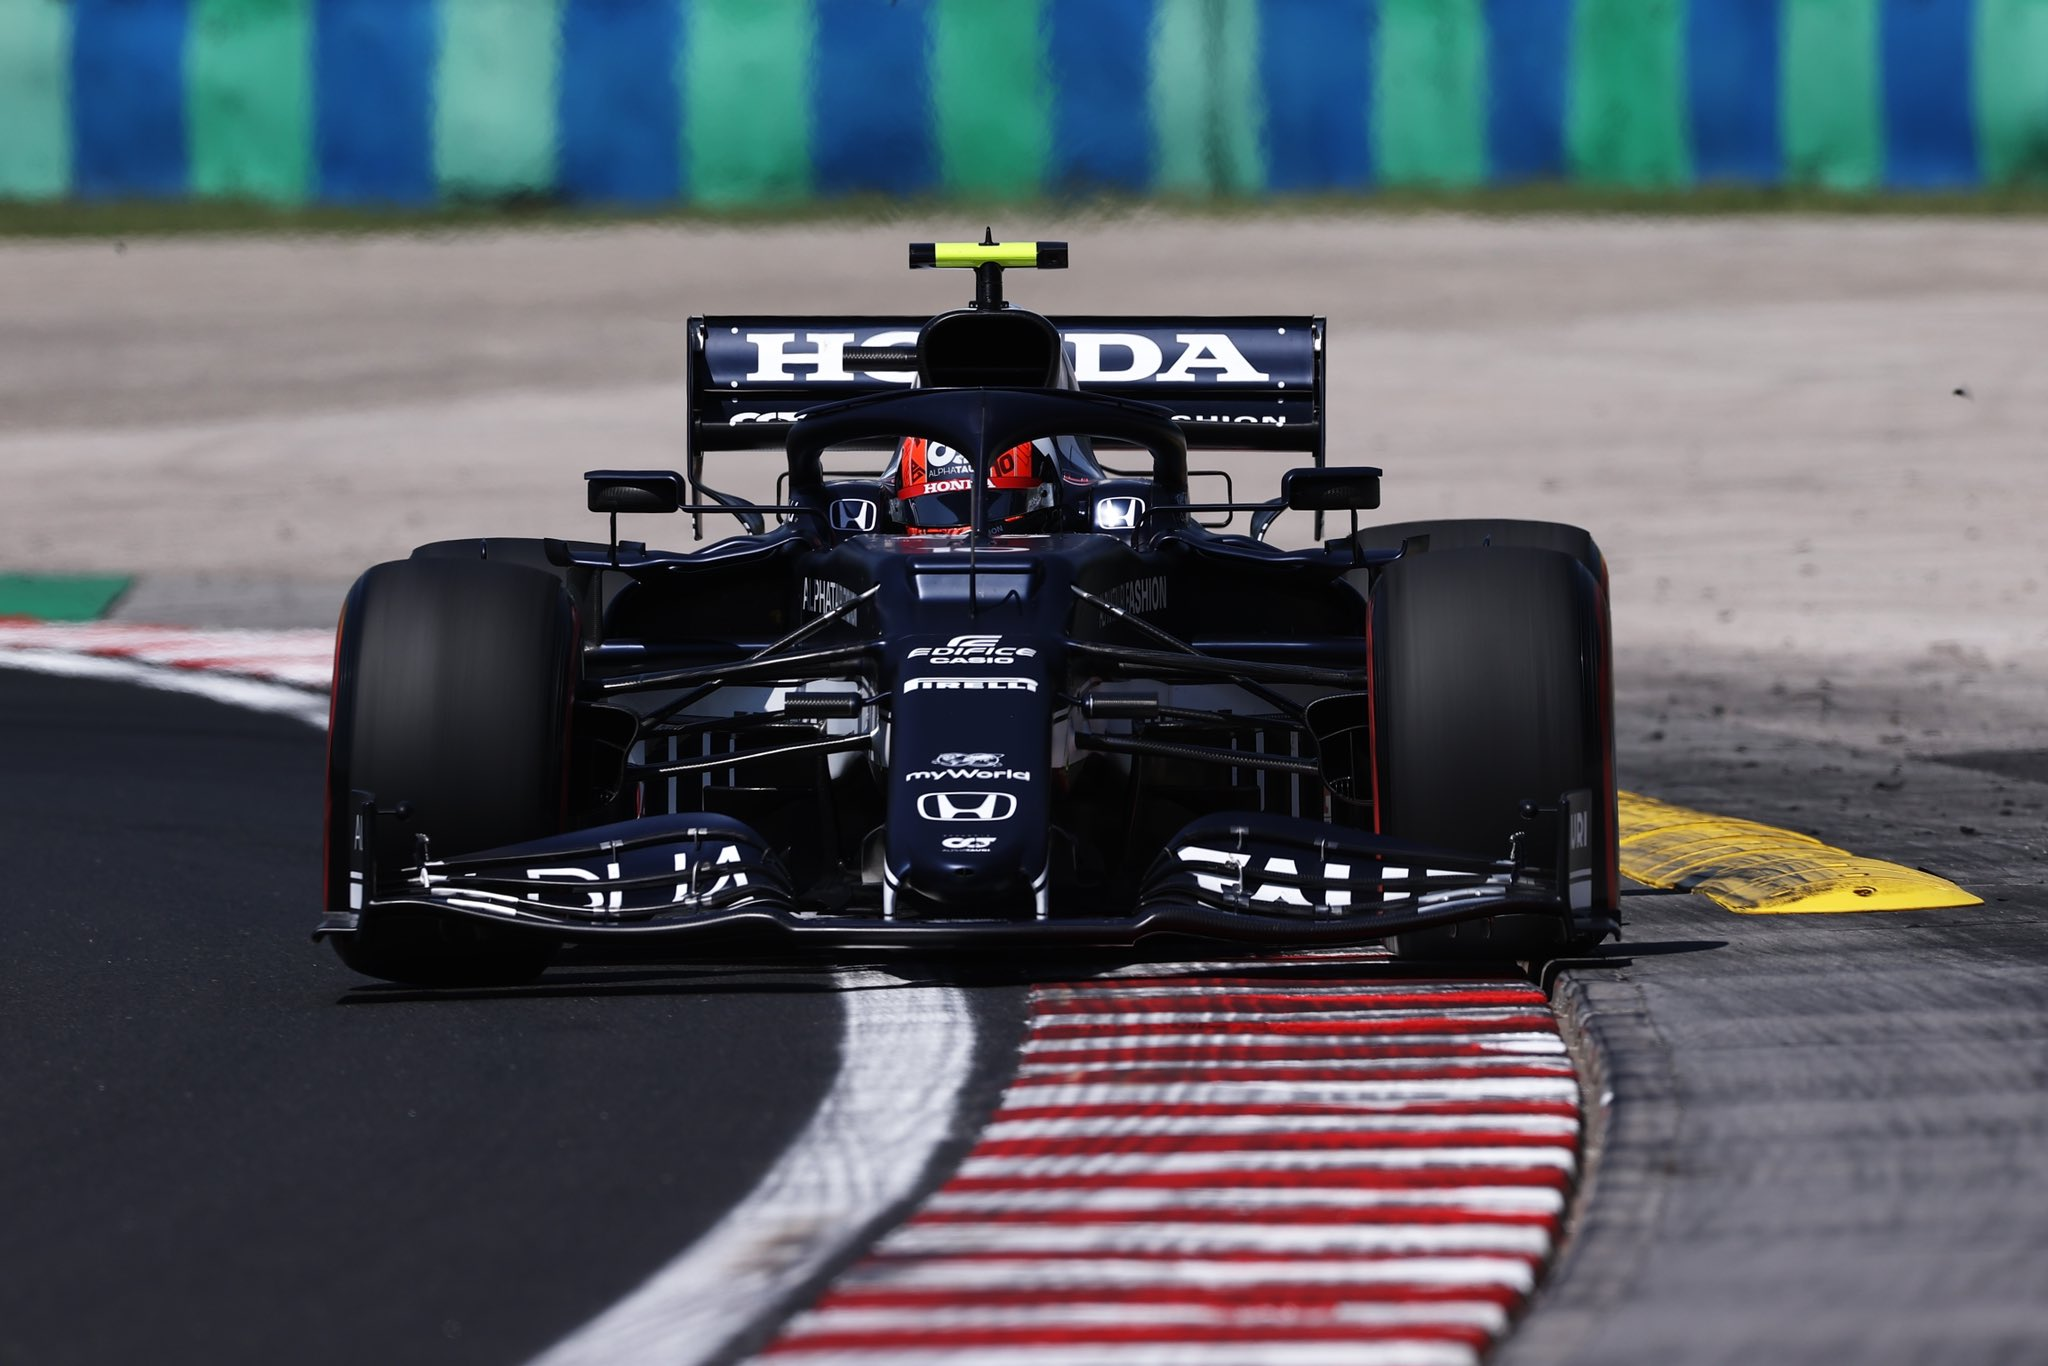 F1 - Les horaires du Grand Prix F1 de Hongrie 2021